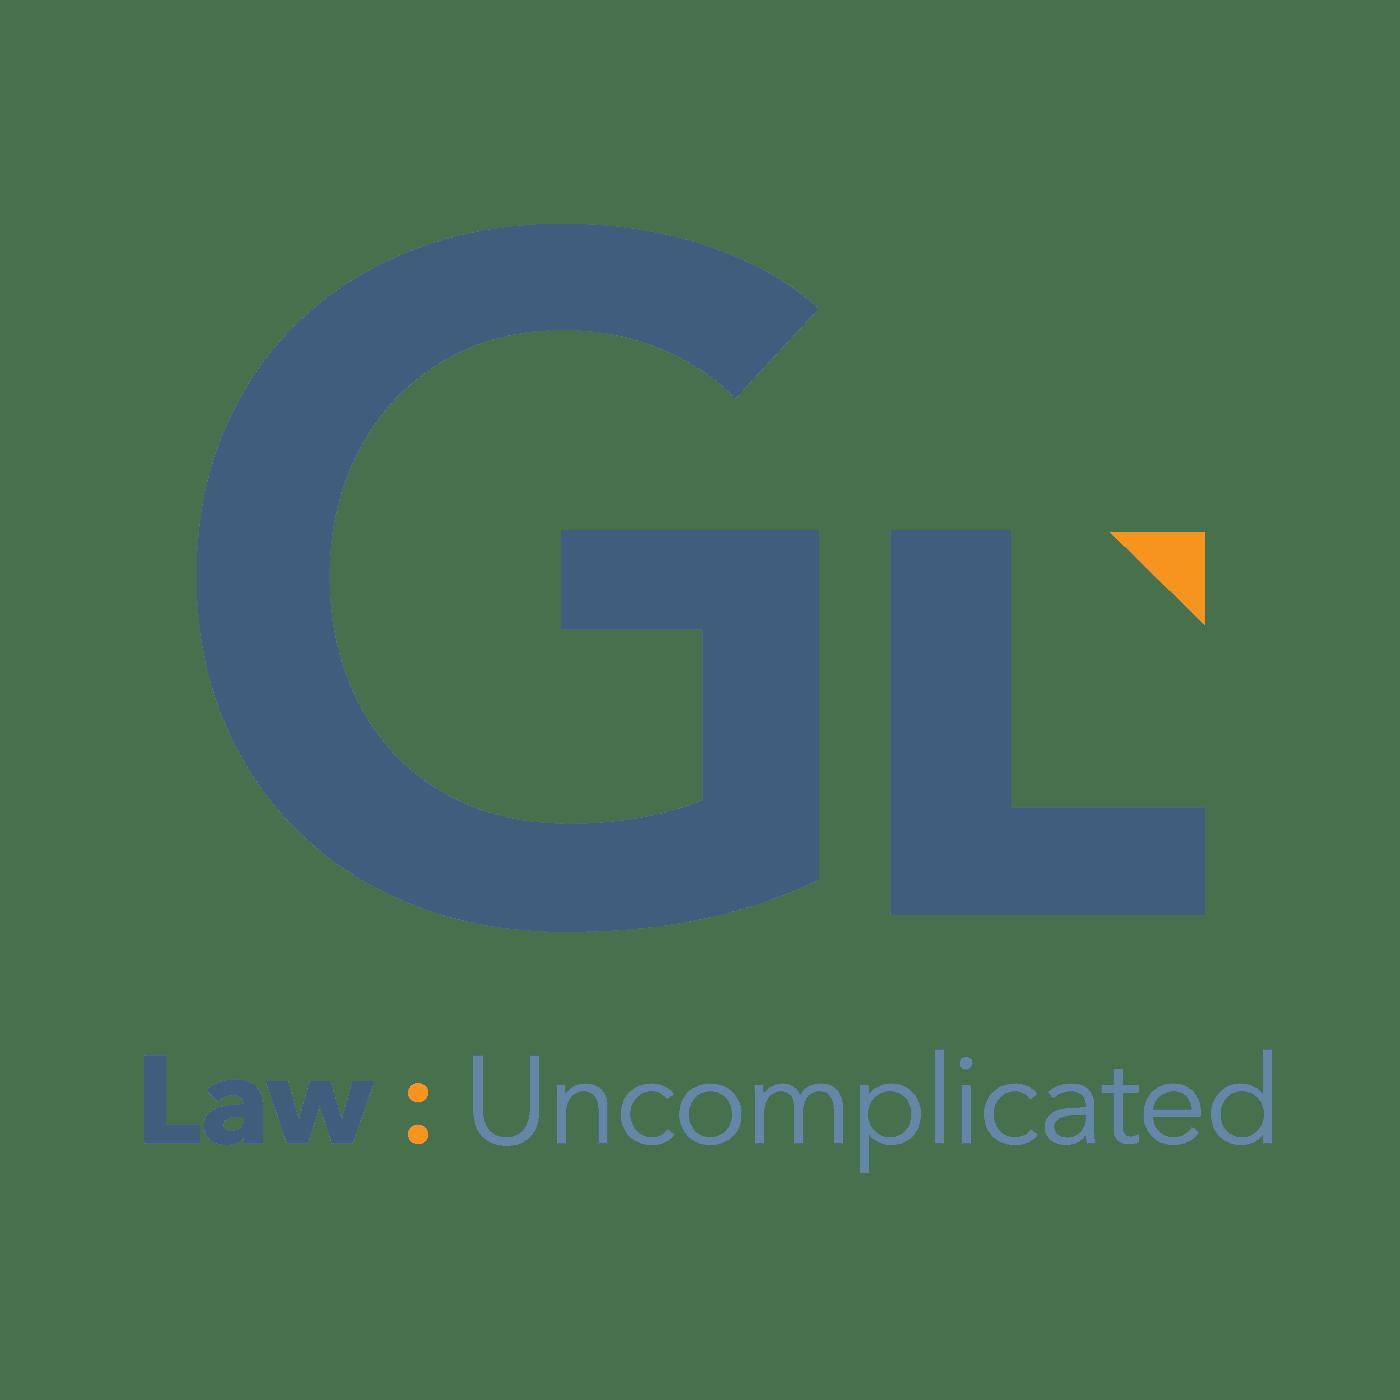 Gravis-GL-color-tag